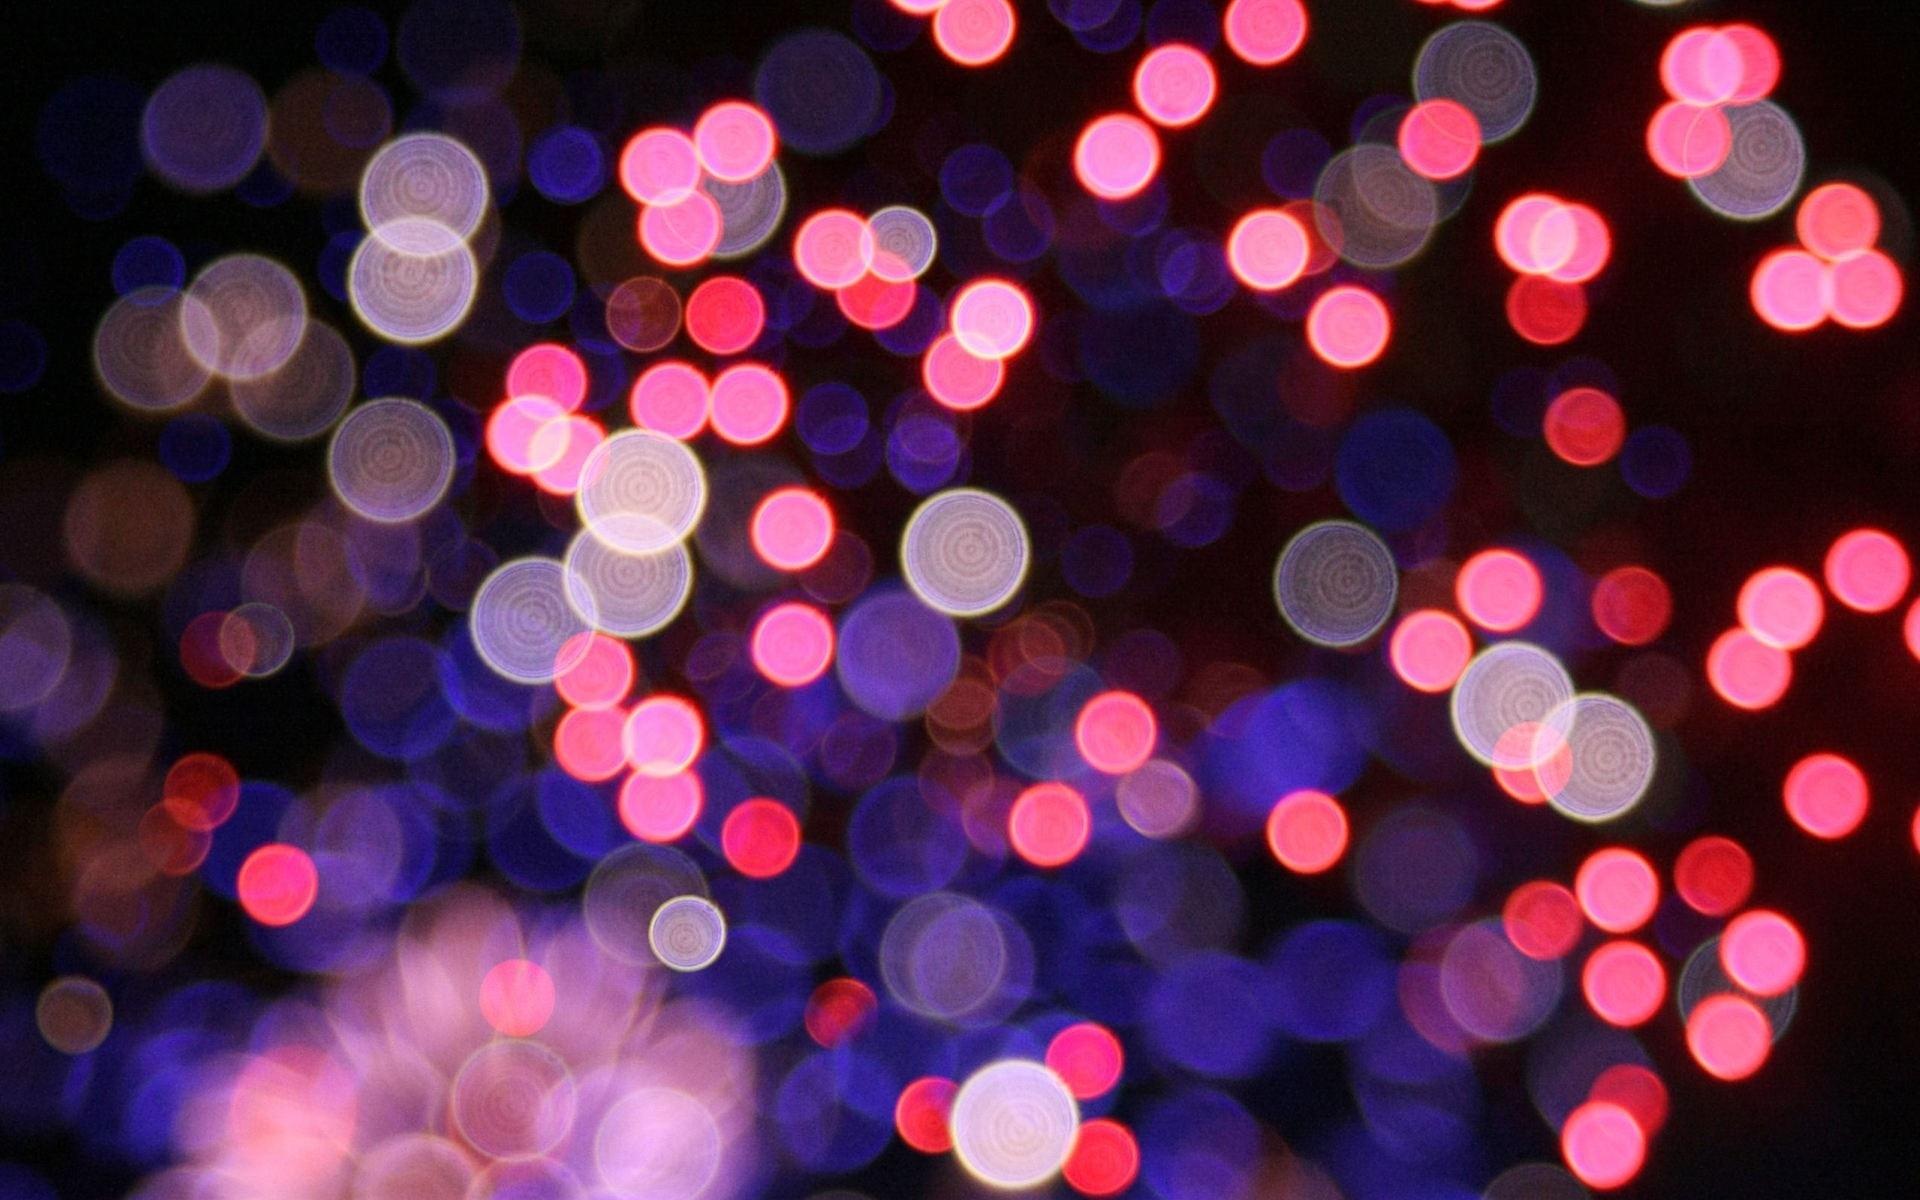 Neon Red Pattern Circle Dots Pink Christmas Lights Highlights Light Color Flower Background Lighting Shape Design